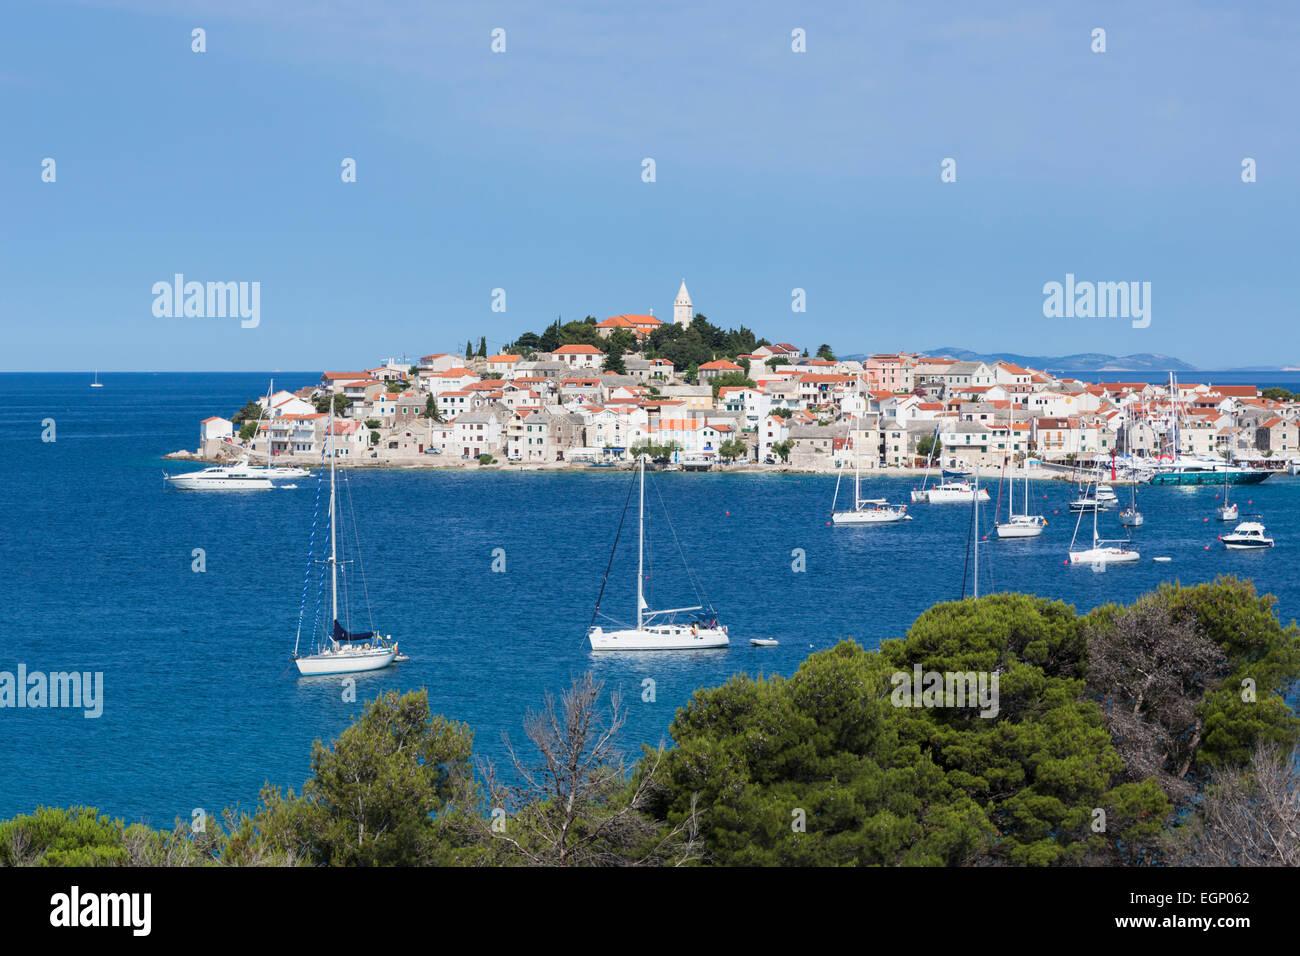 Primosten, Sibenik-Knin County, Croatia. Popular resort town on the Adriatic coastline. - Stock Image